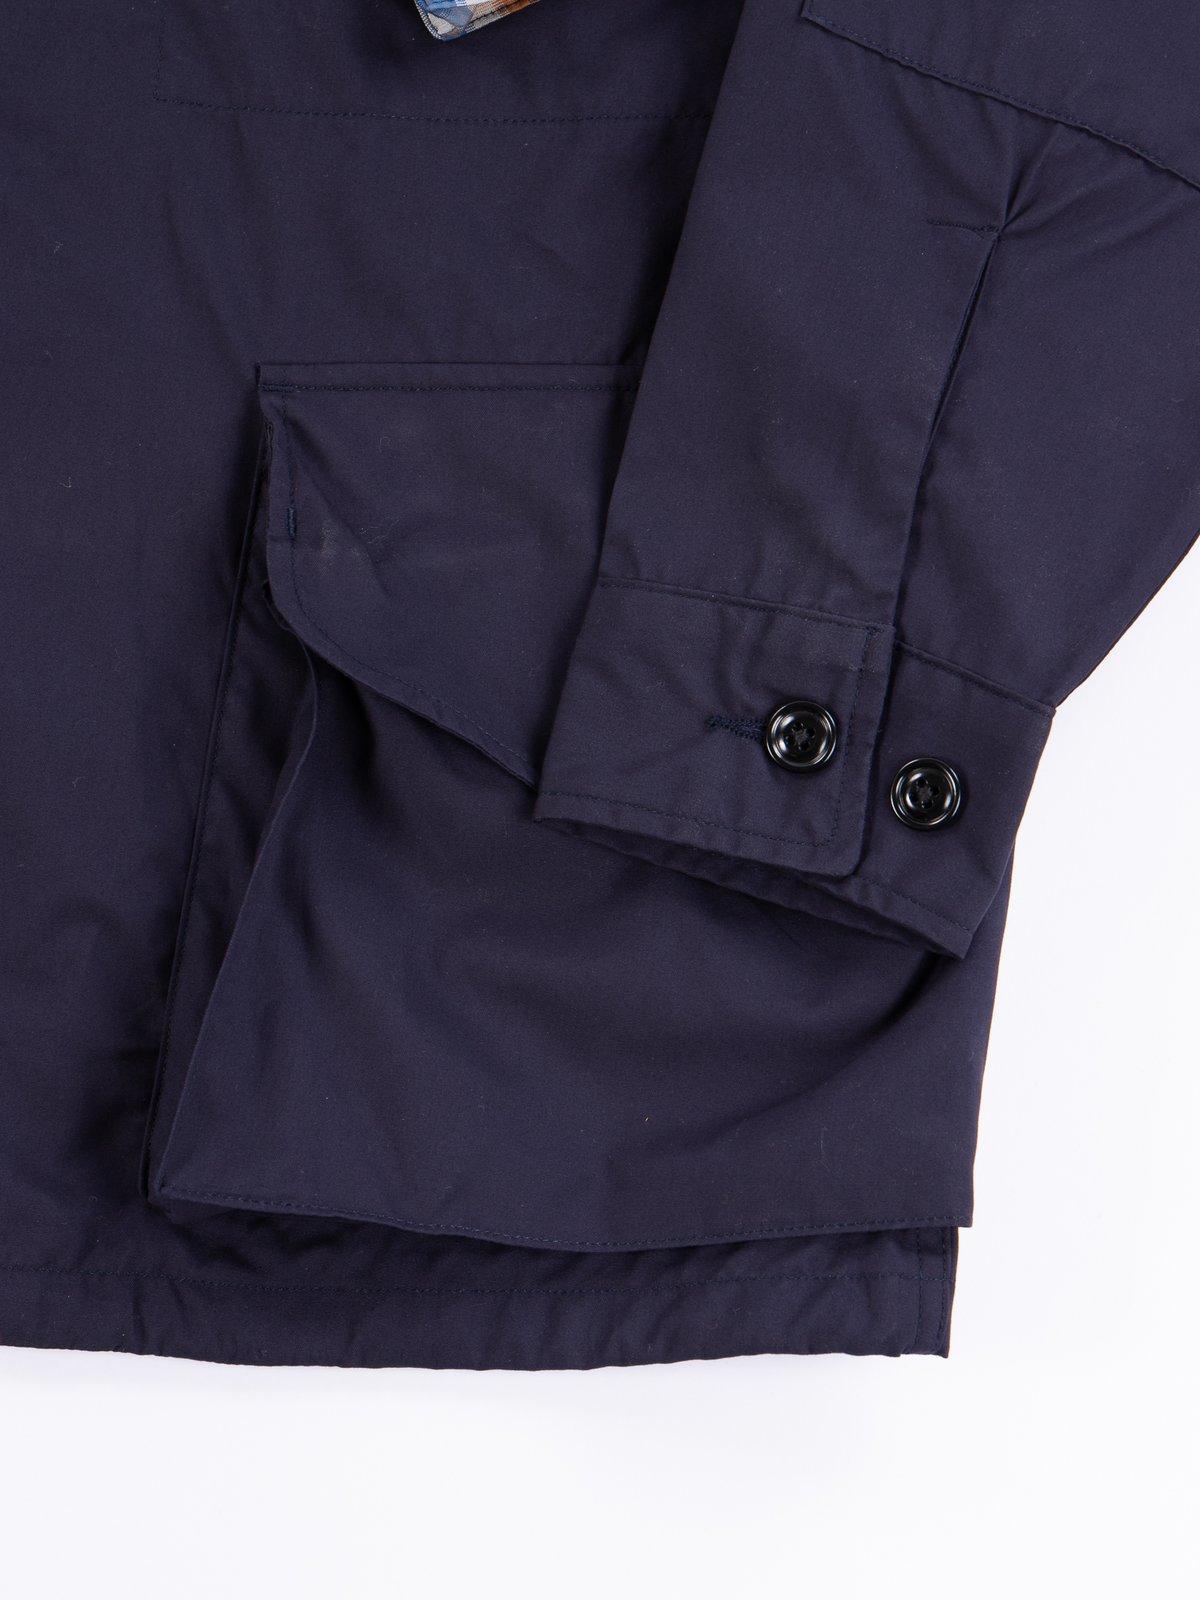 Navy Vancloth Oxford Military Half Coat Type B Exclusive - Image 5